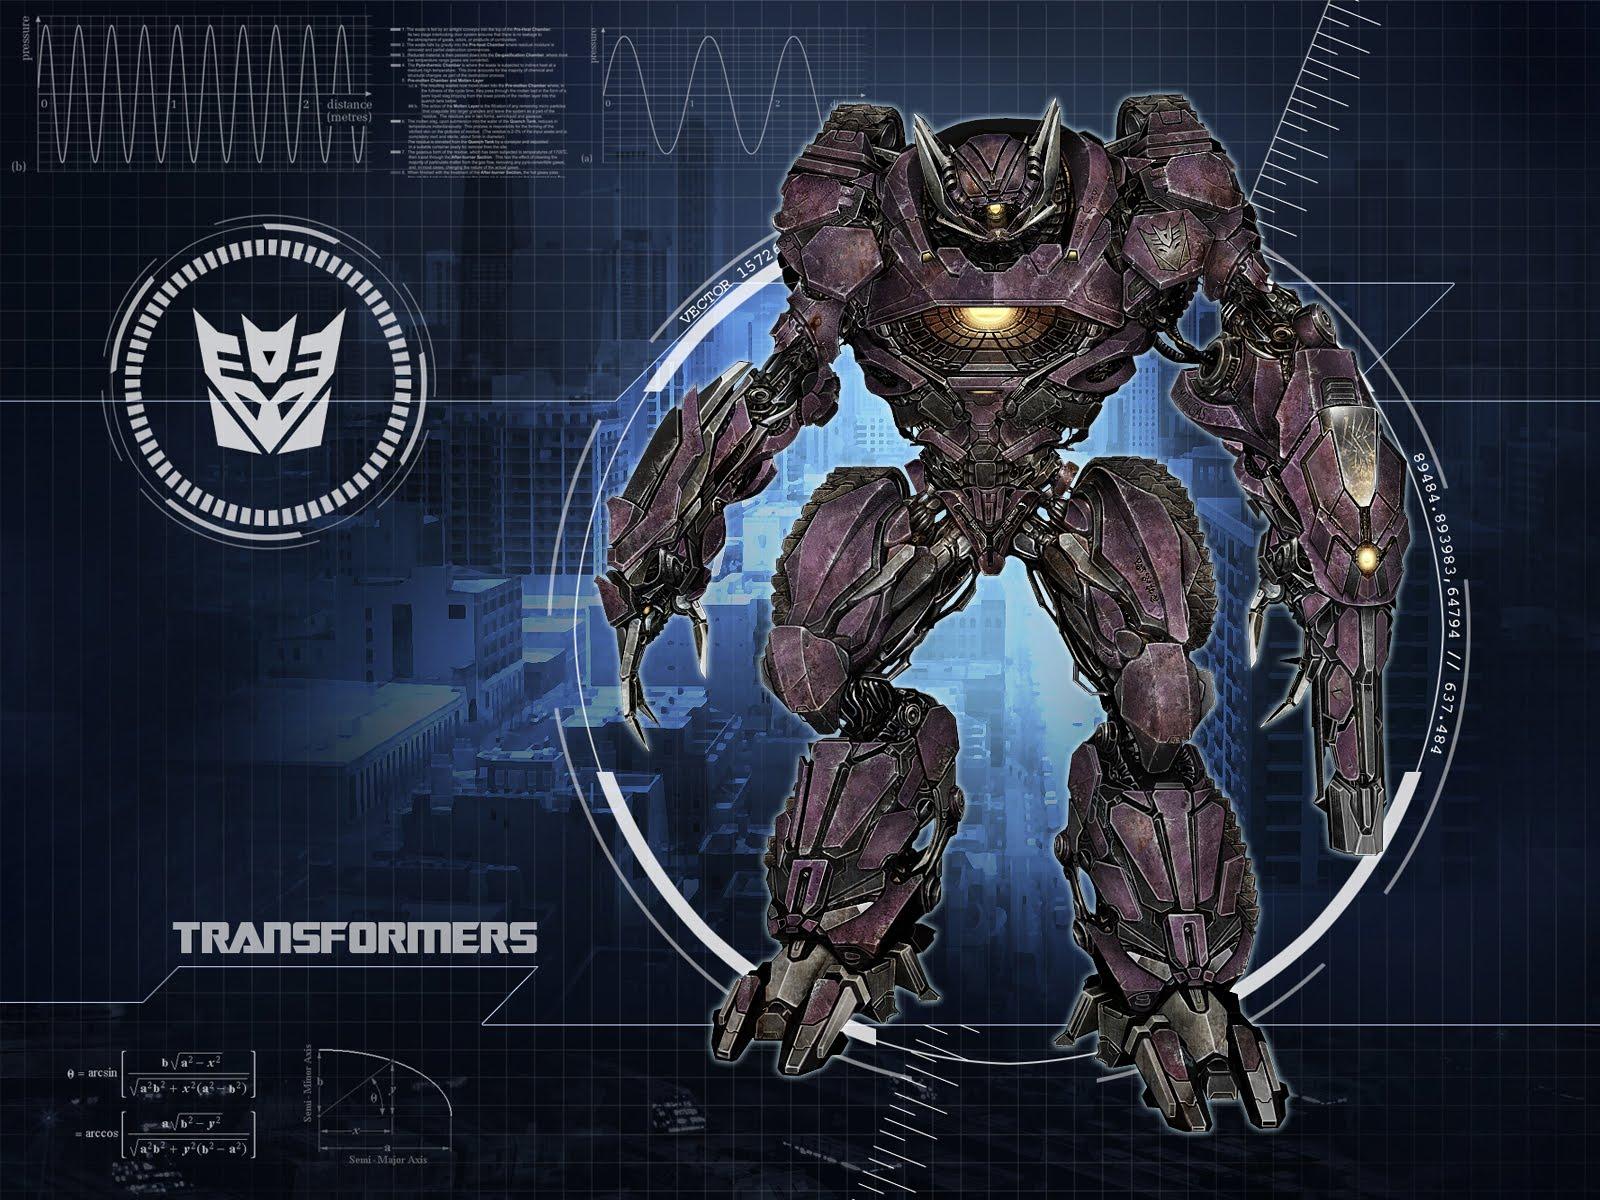 Cheats S30SCI Movie | The New Villain in Transformers 3: Dark of the